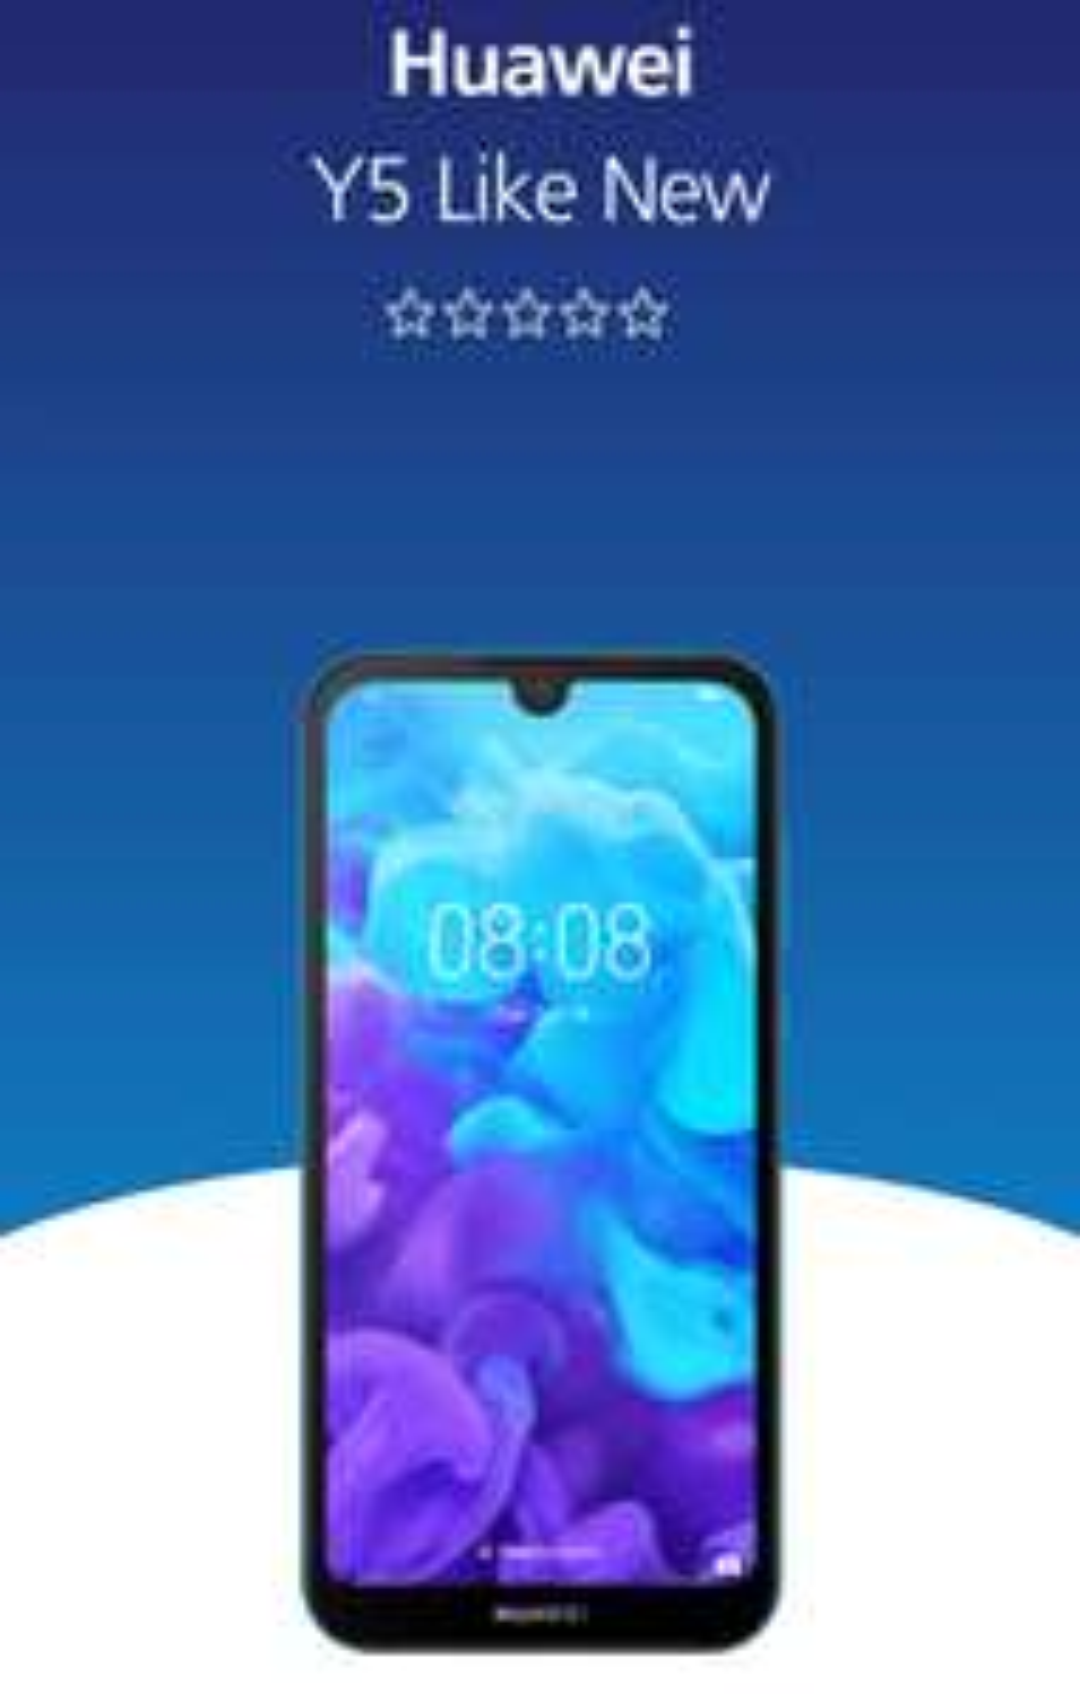 Huawei Y5 2019 Like New £39 @ O2